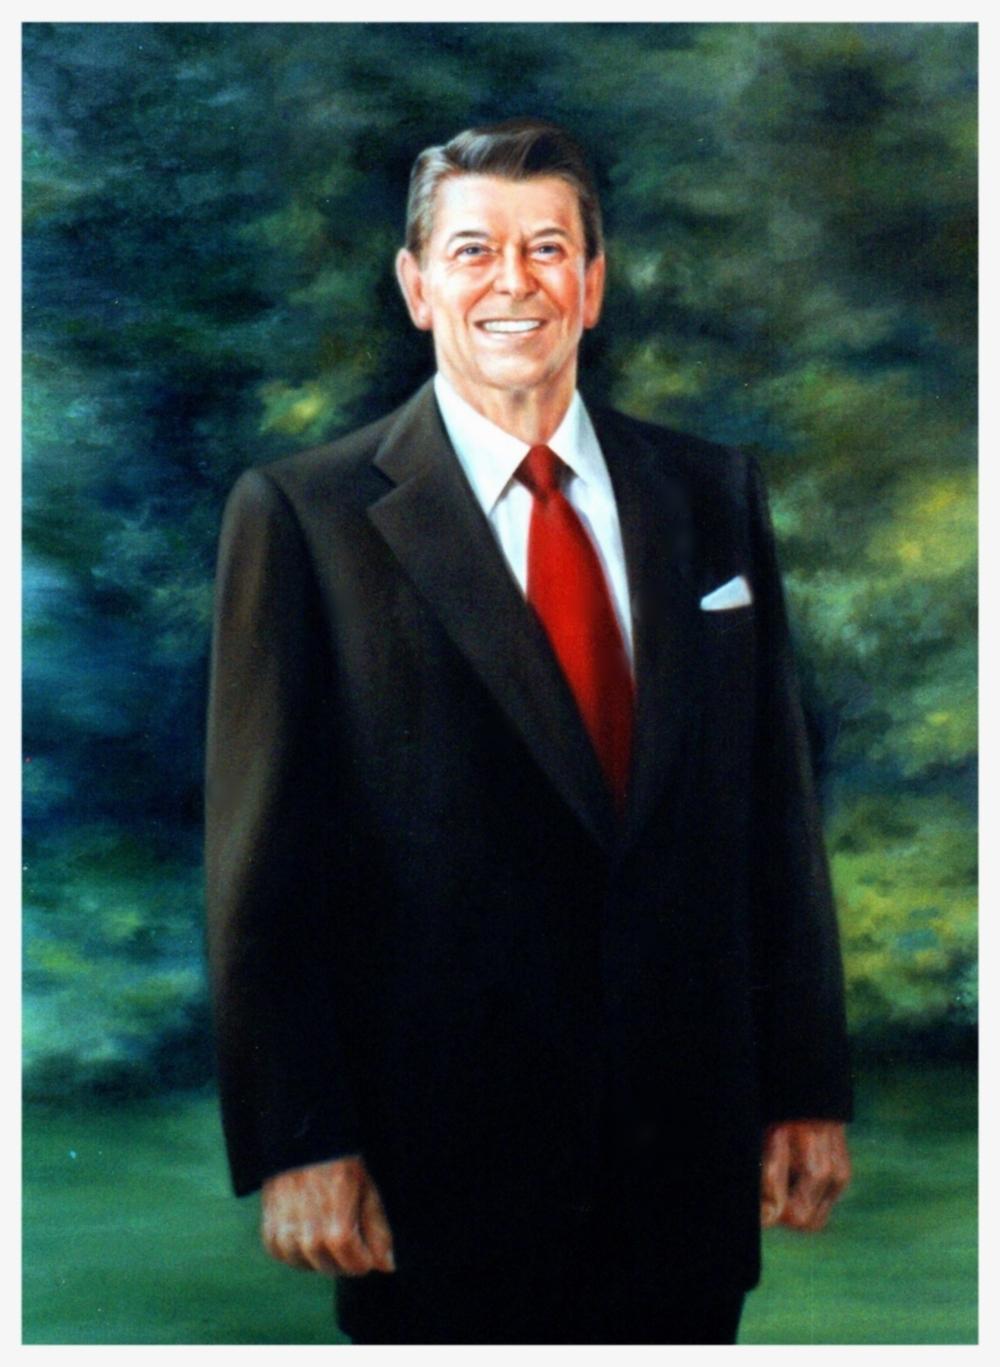 ReaganFeb16.jpg